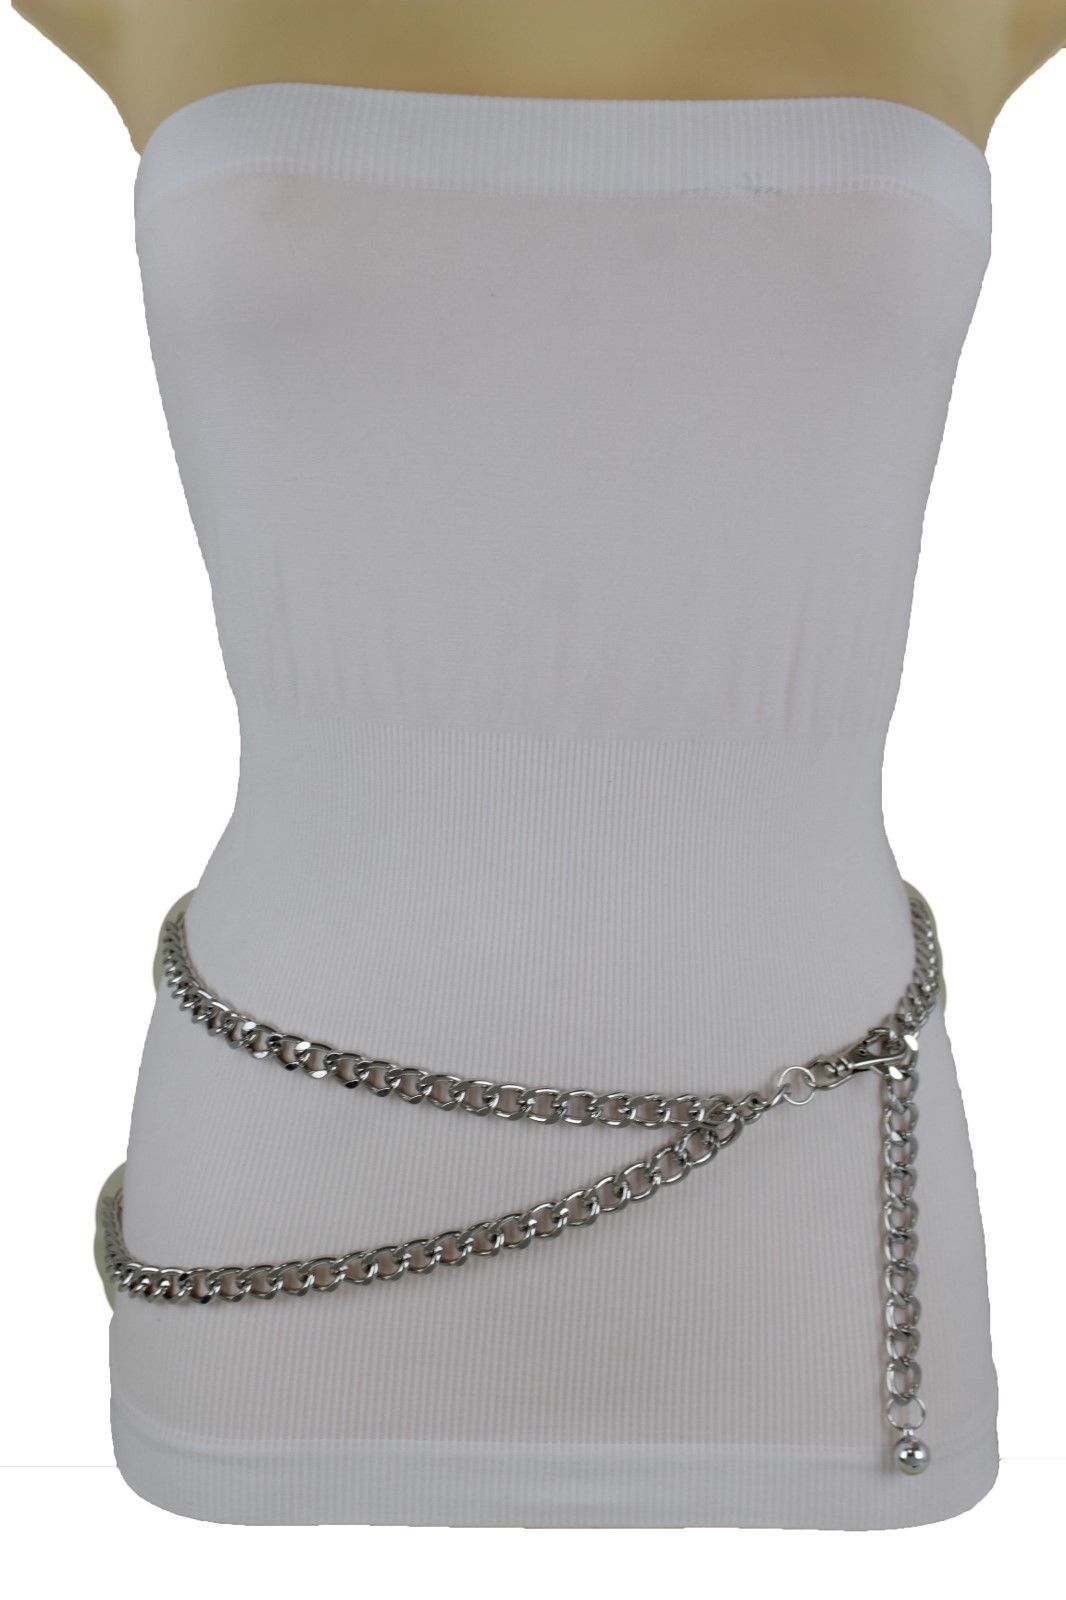 7bc1c9a19006 Black Silver Gold Hot Women Belt Metal Chain Links Hip Waist New Biker Punk  Fashion Accessories